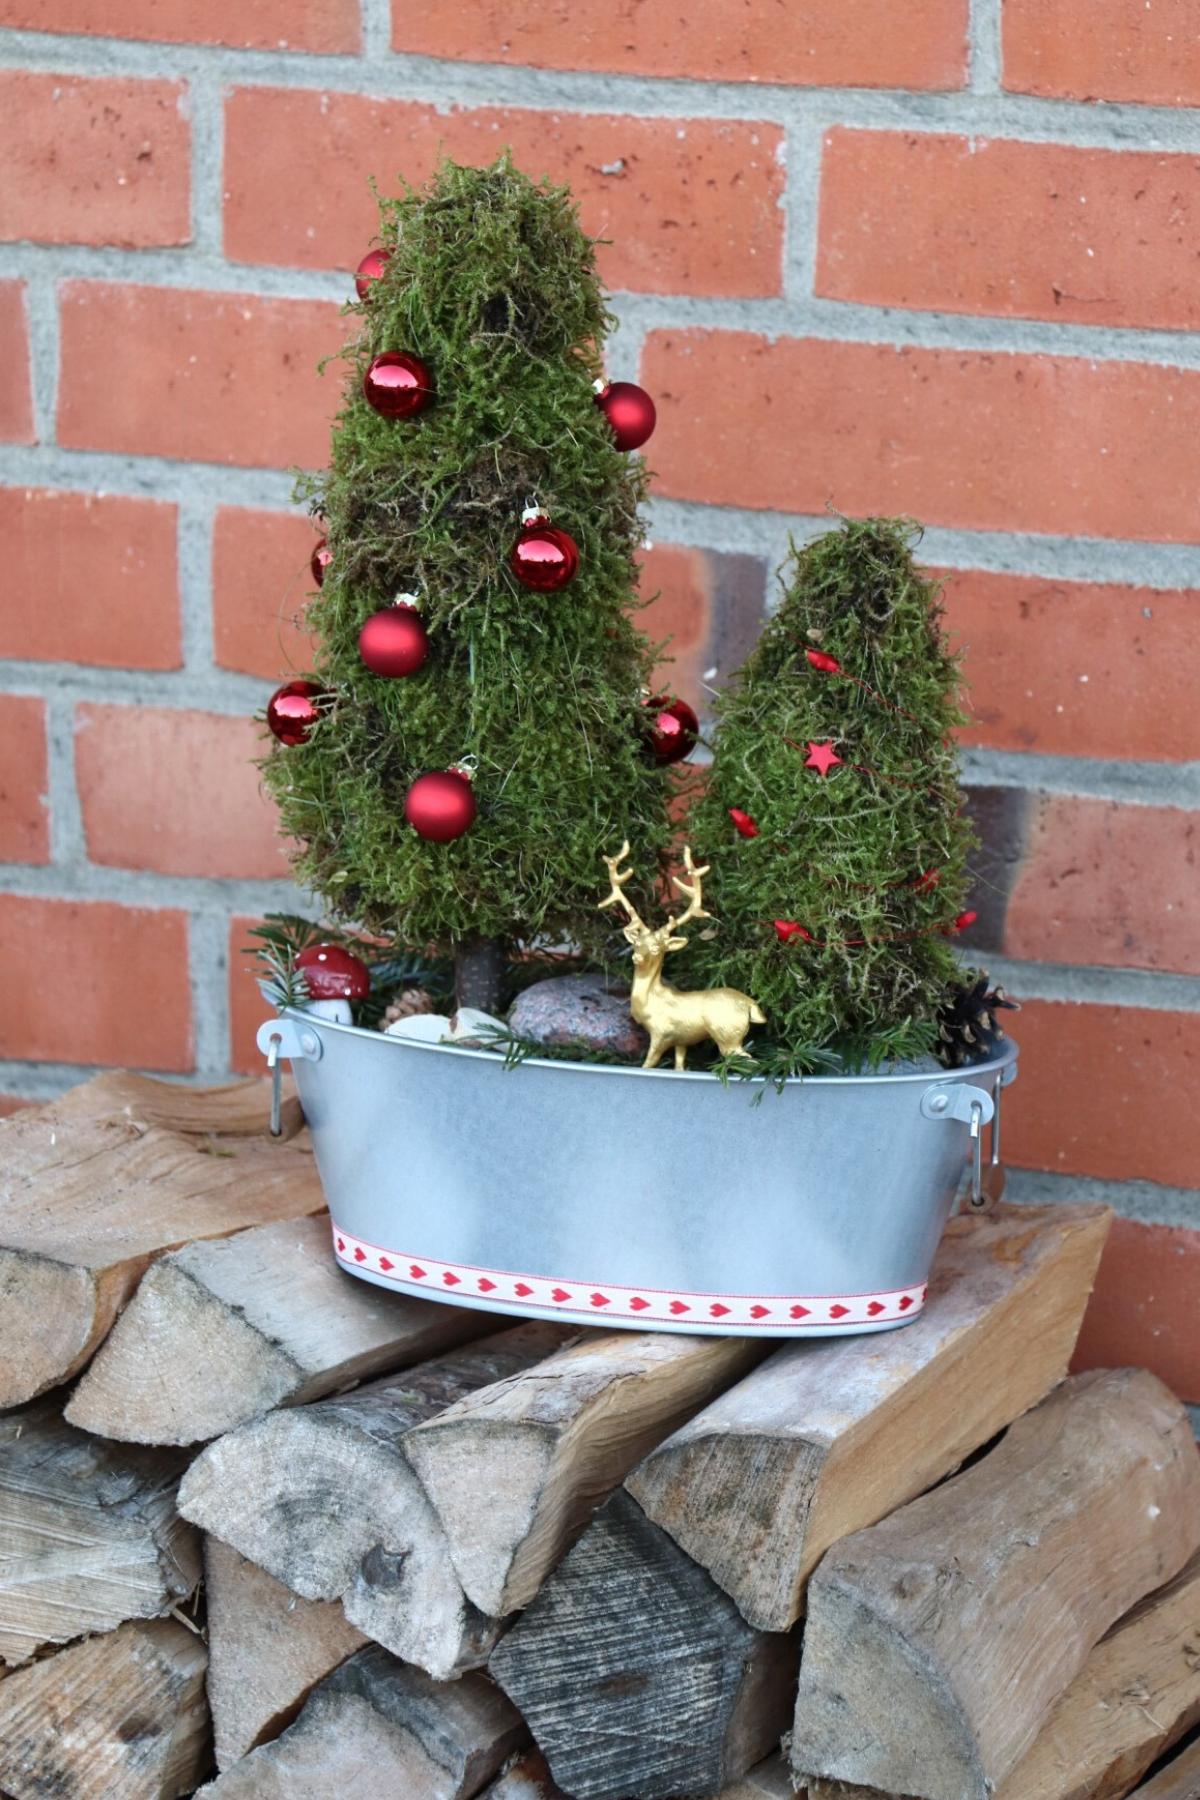 Moos Tannenbaume Diy Fur Ein Adventsgesteck Lavendelblog Adventsgesteck Gestecke Naturmaterialien